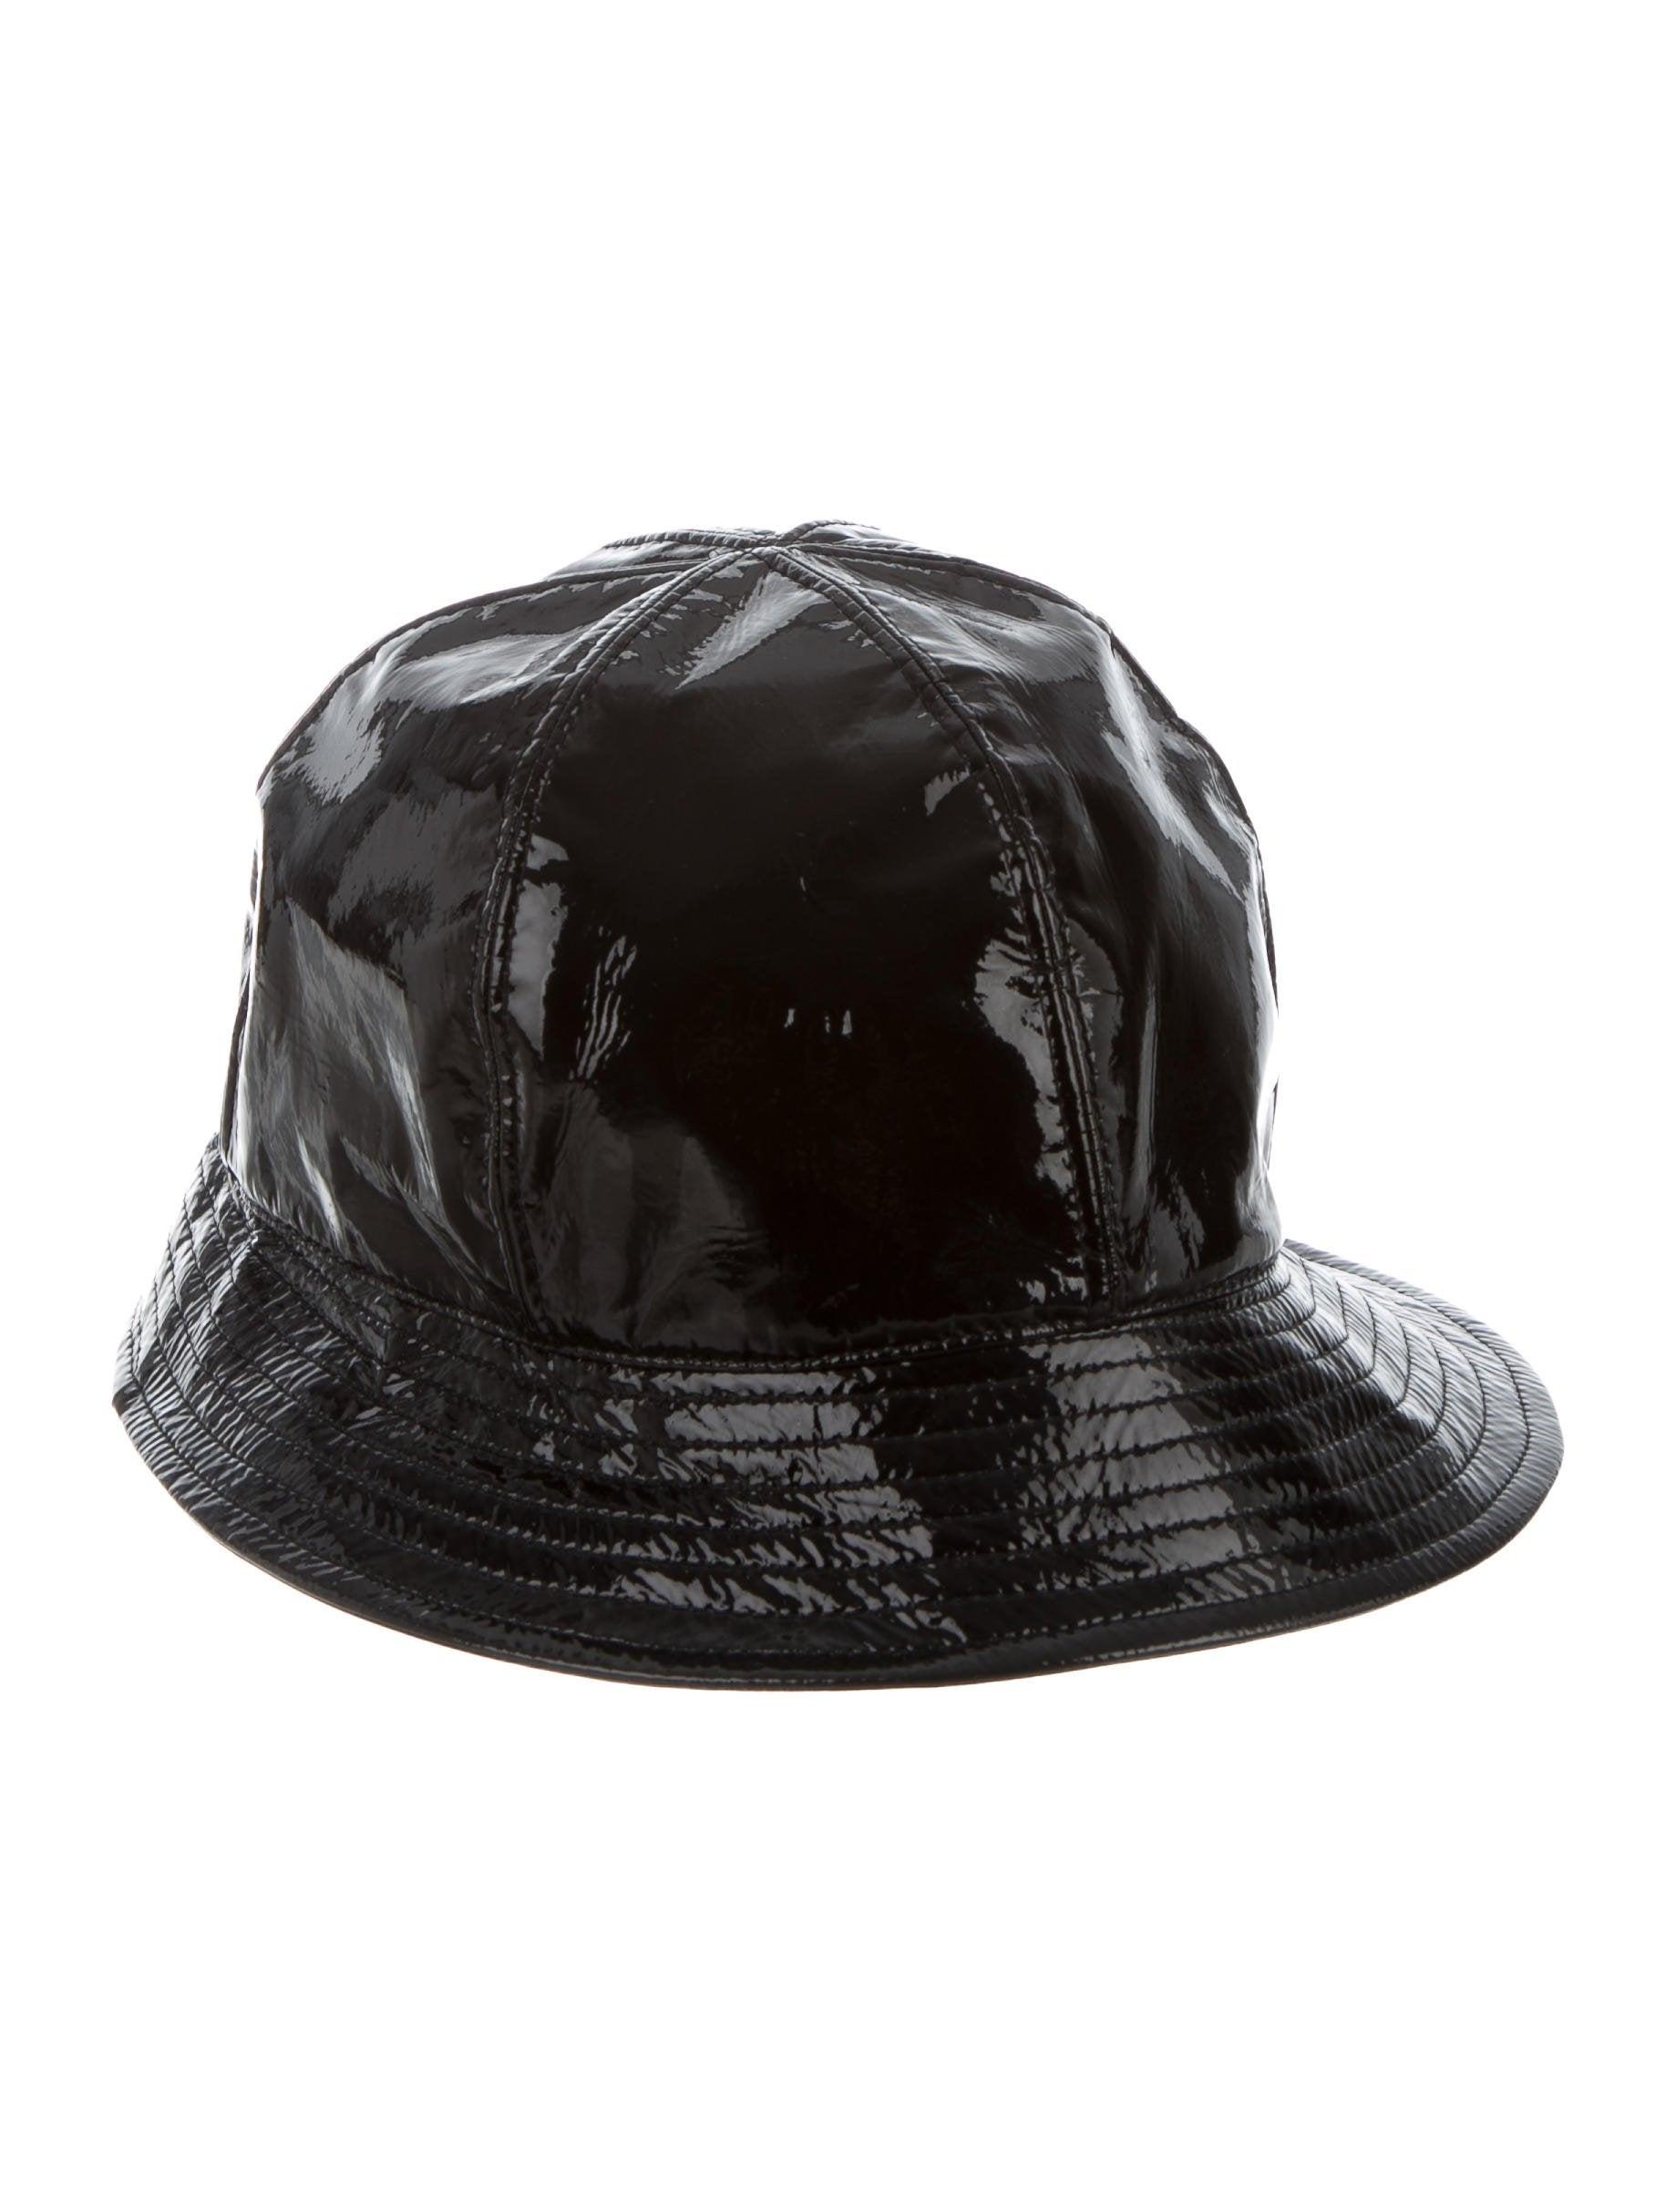 7df8b02b559dbc Chanel Vinyl Bucket Hat - Accessories - CHA301257 | The RealReal